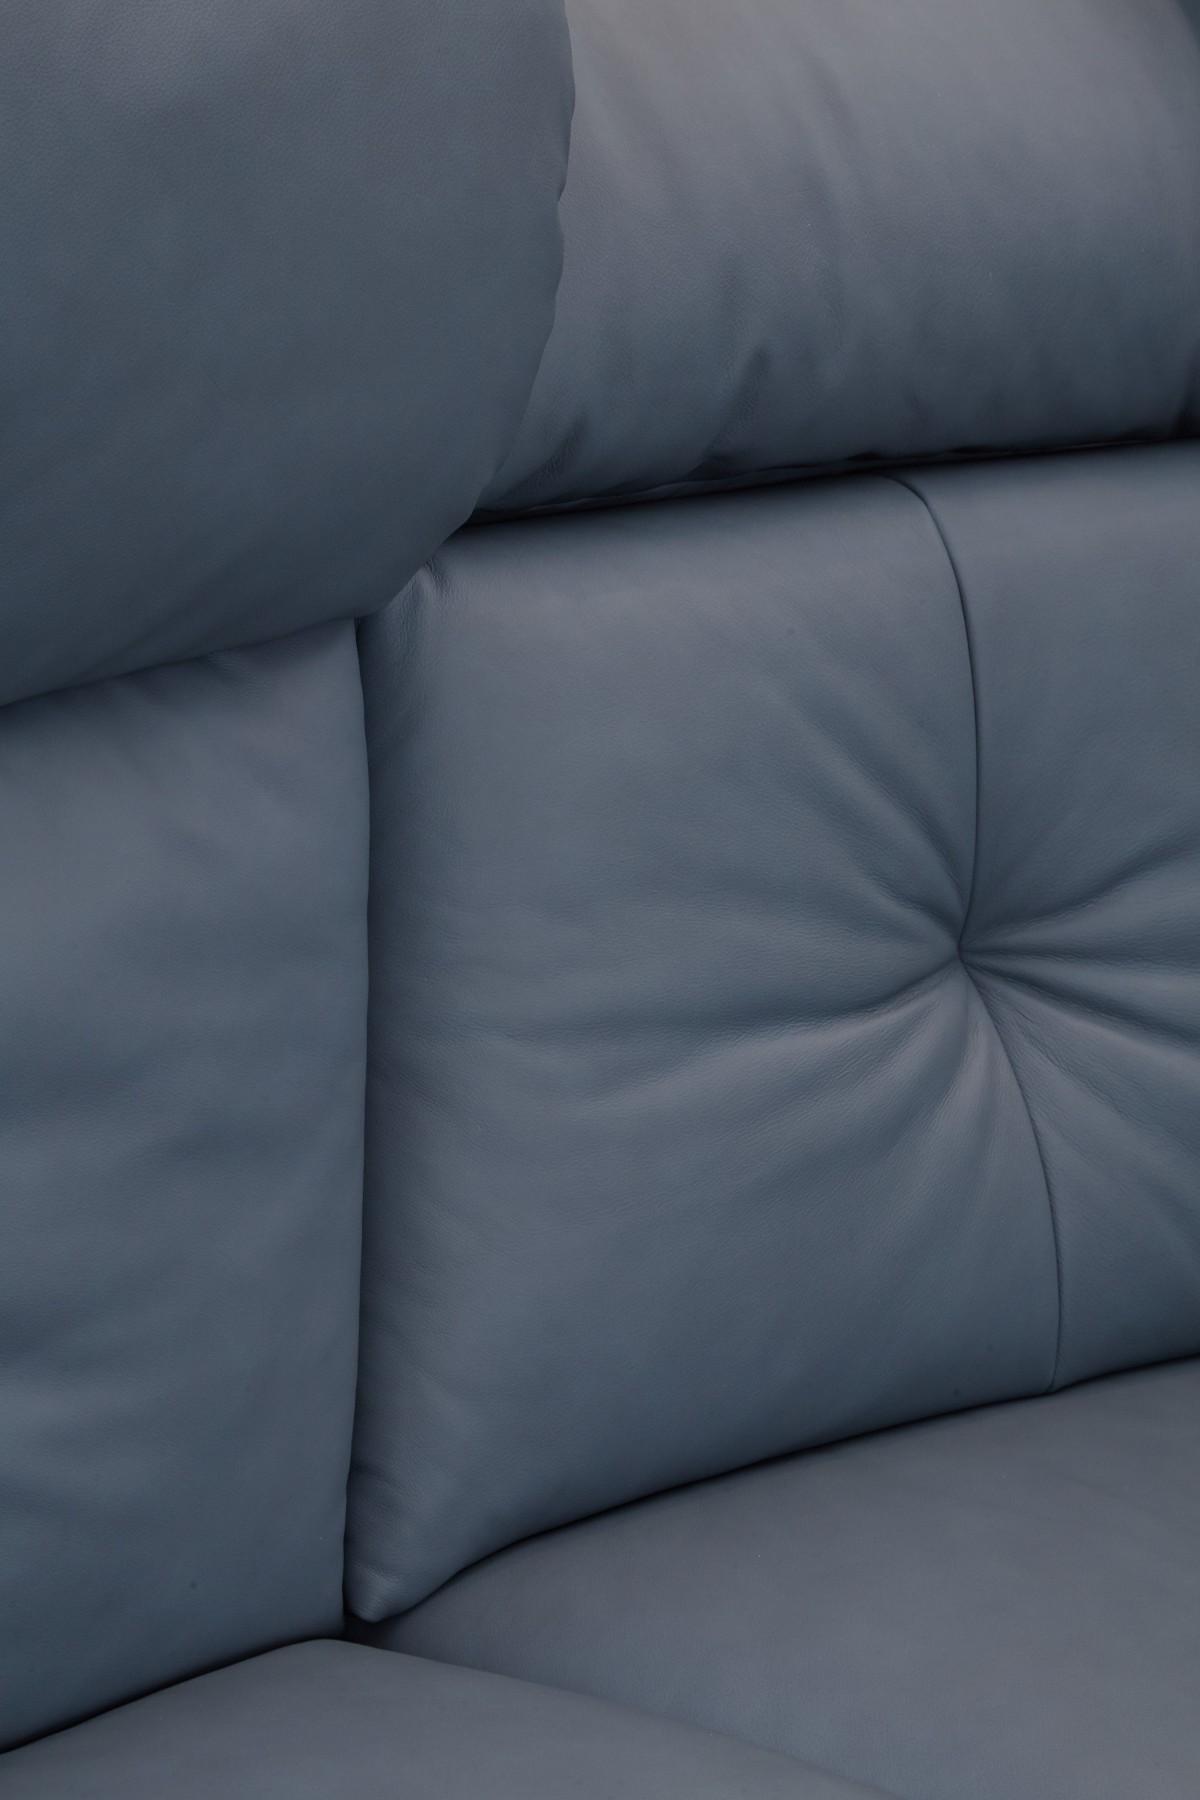 Himolla Swan Trapezoidal Recliner Sofa